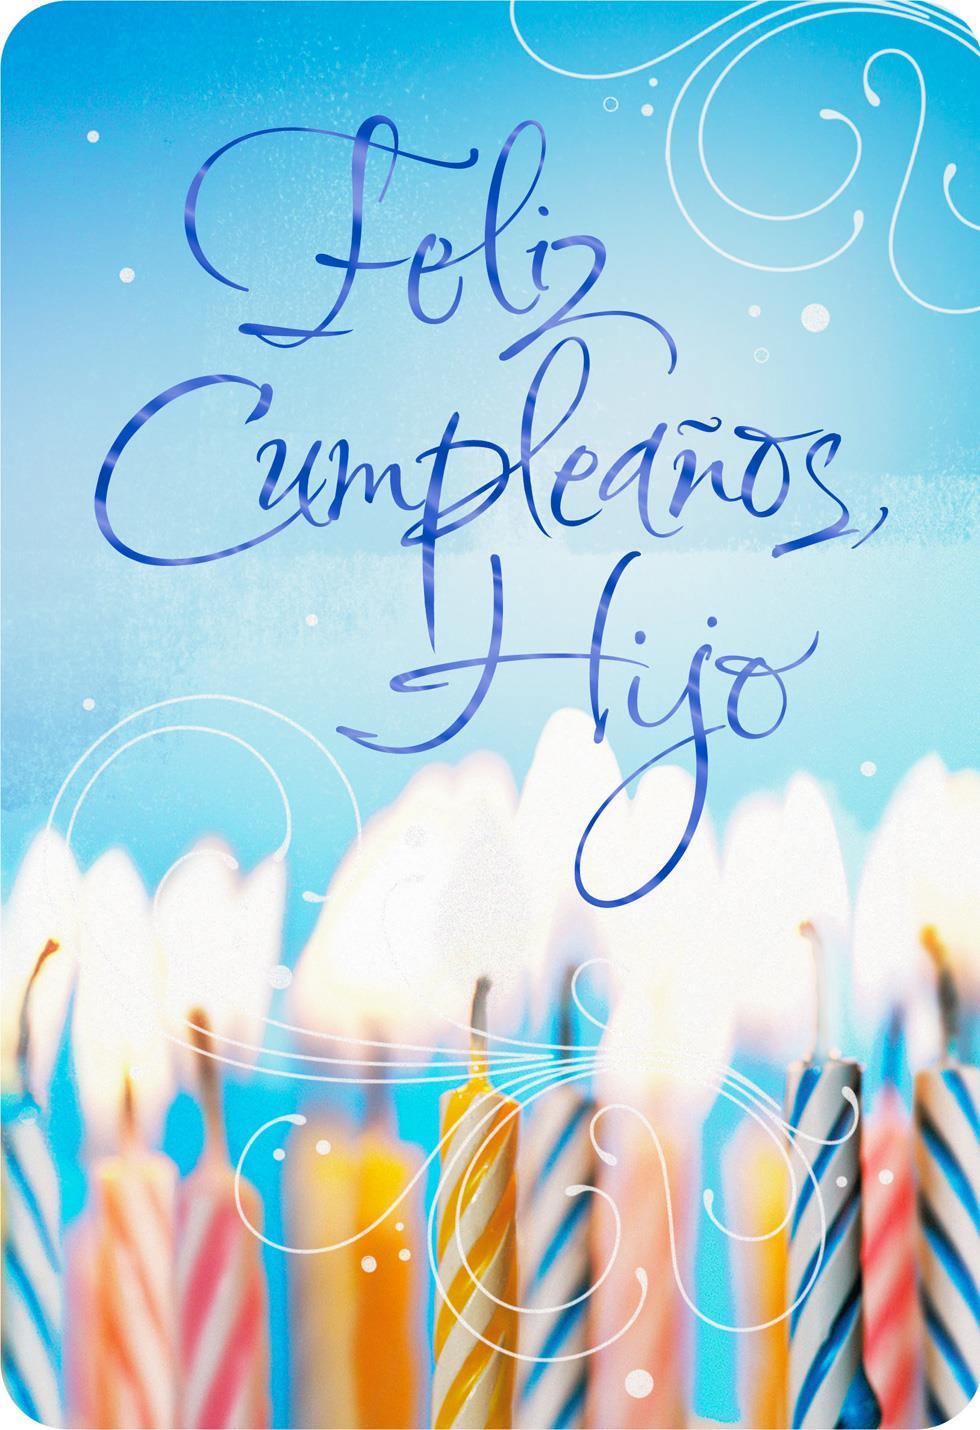 Every Moment With Joy Spanish Language Son Birthday Card